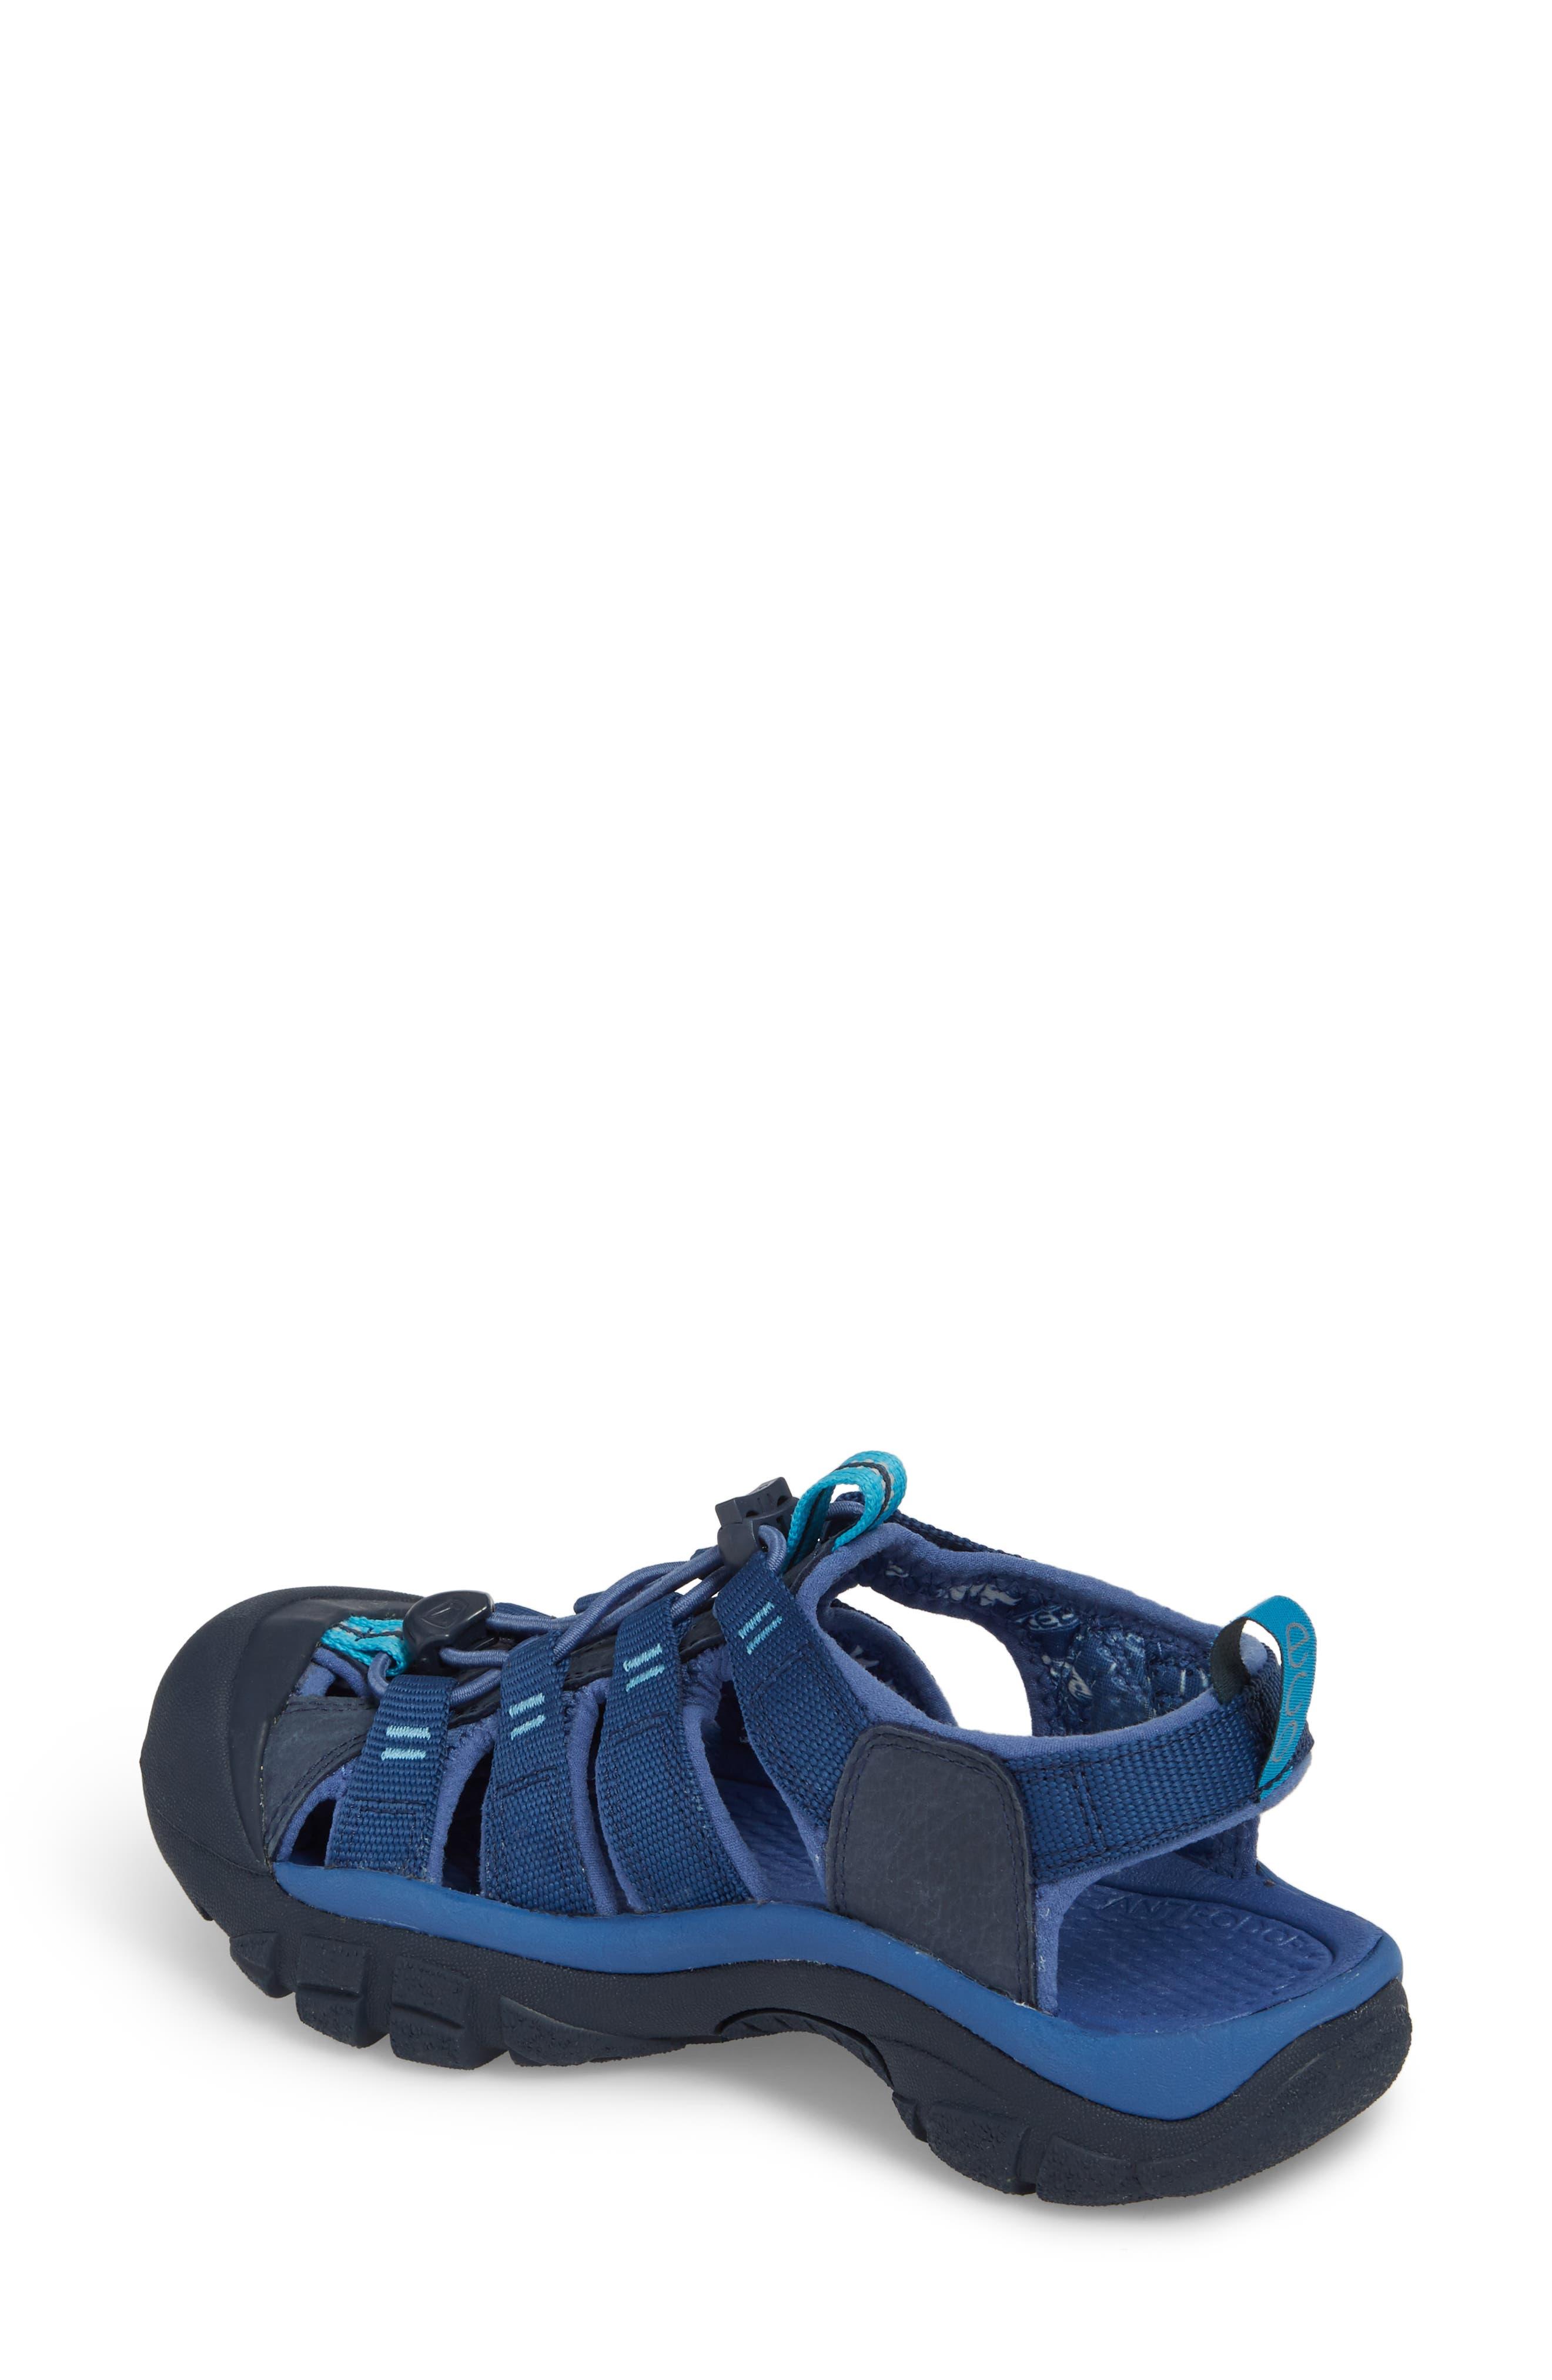 Alternate Image 2  - Keen Newport Eco Waterproof Sandal (Women)